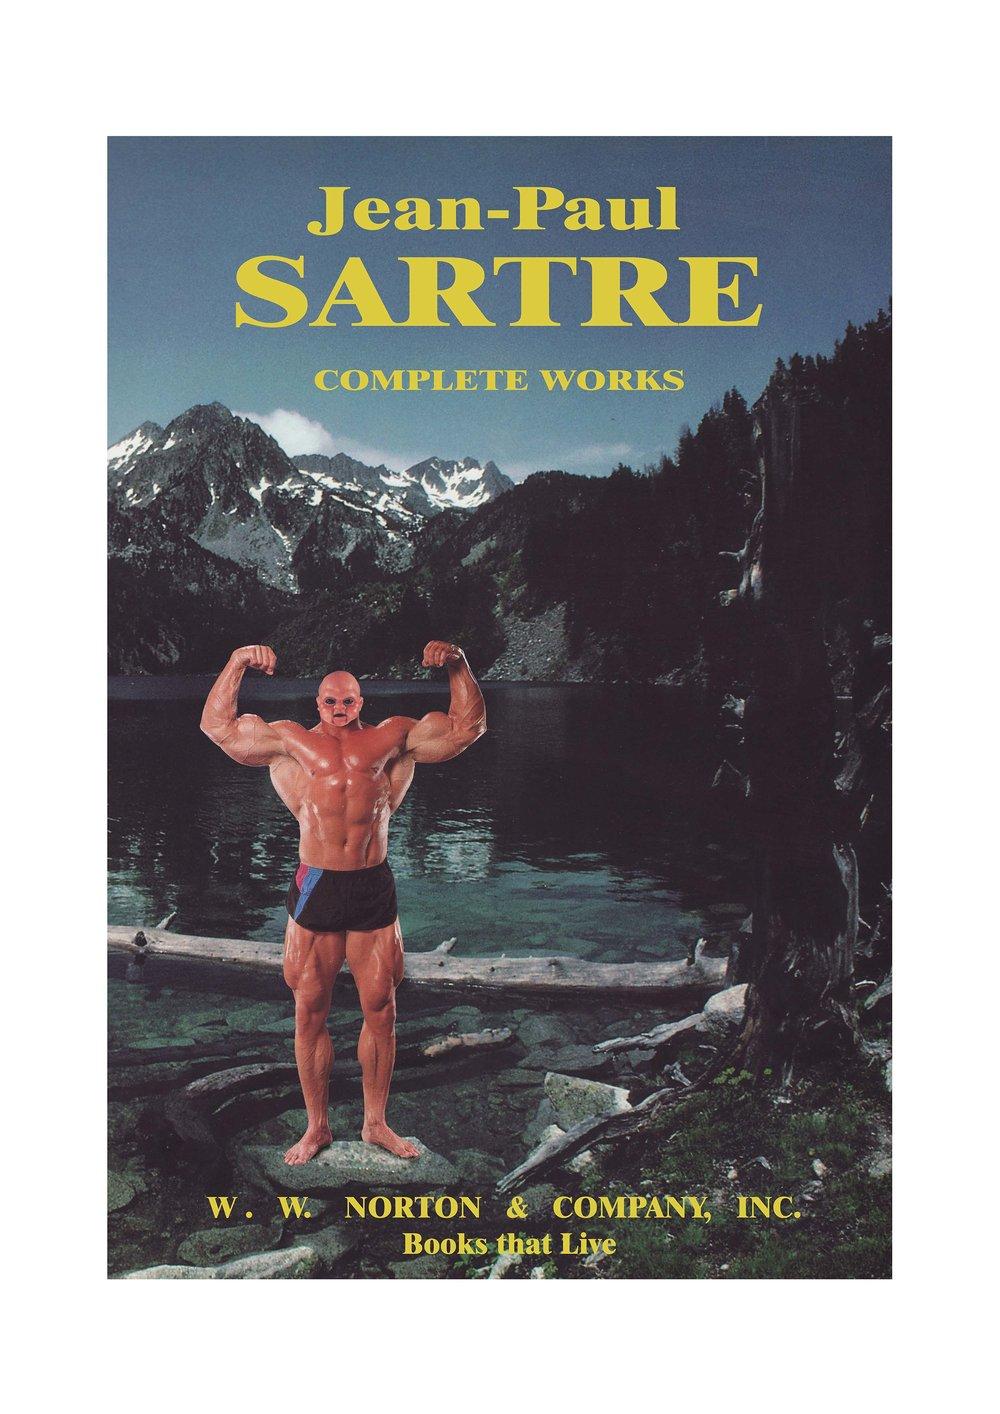 Sartre: Complete Works , 2009. C-print, 98 x 68 cm.